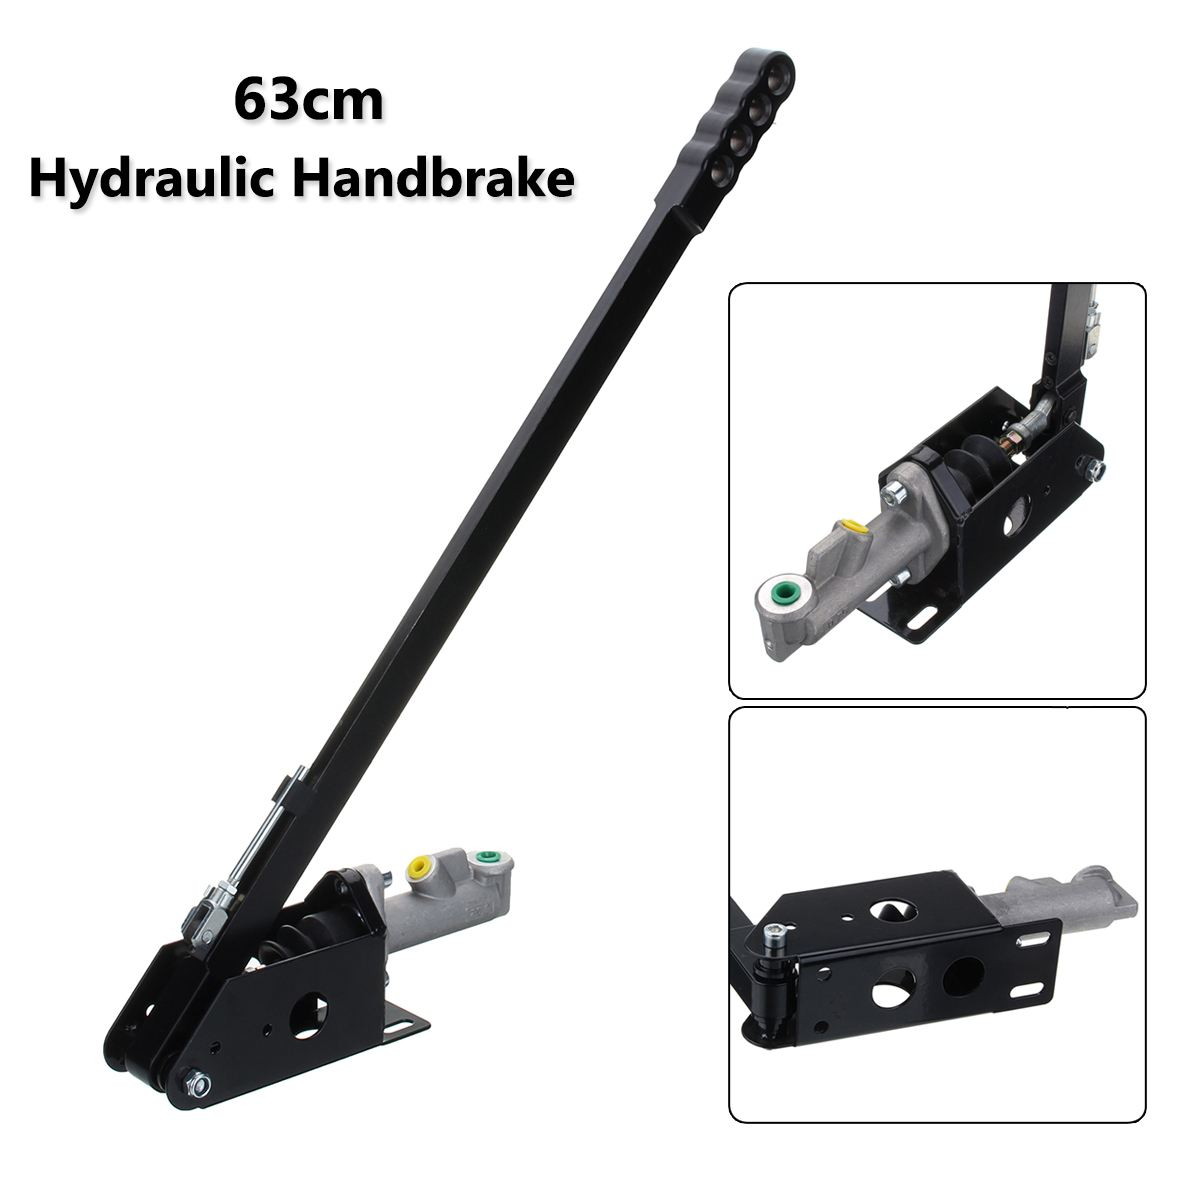 63 cm universel Long Vertical hydraulique frein à main Hydro e-frein dérive course frein à main